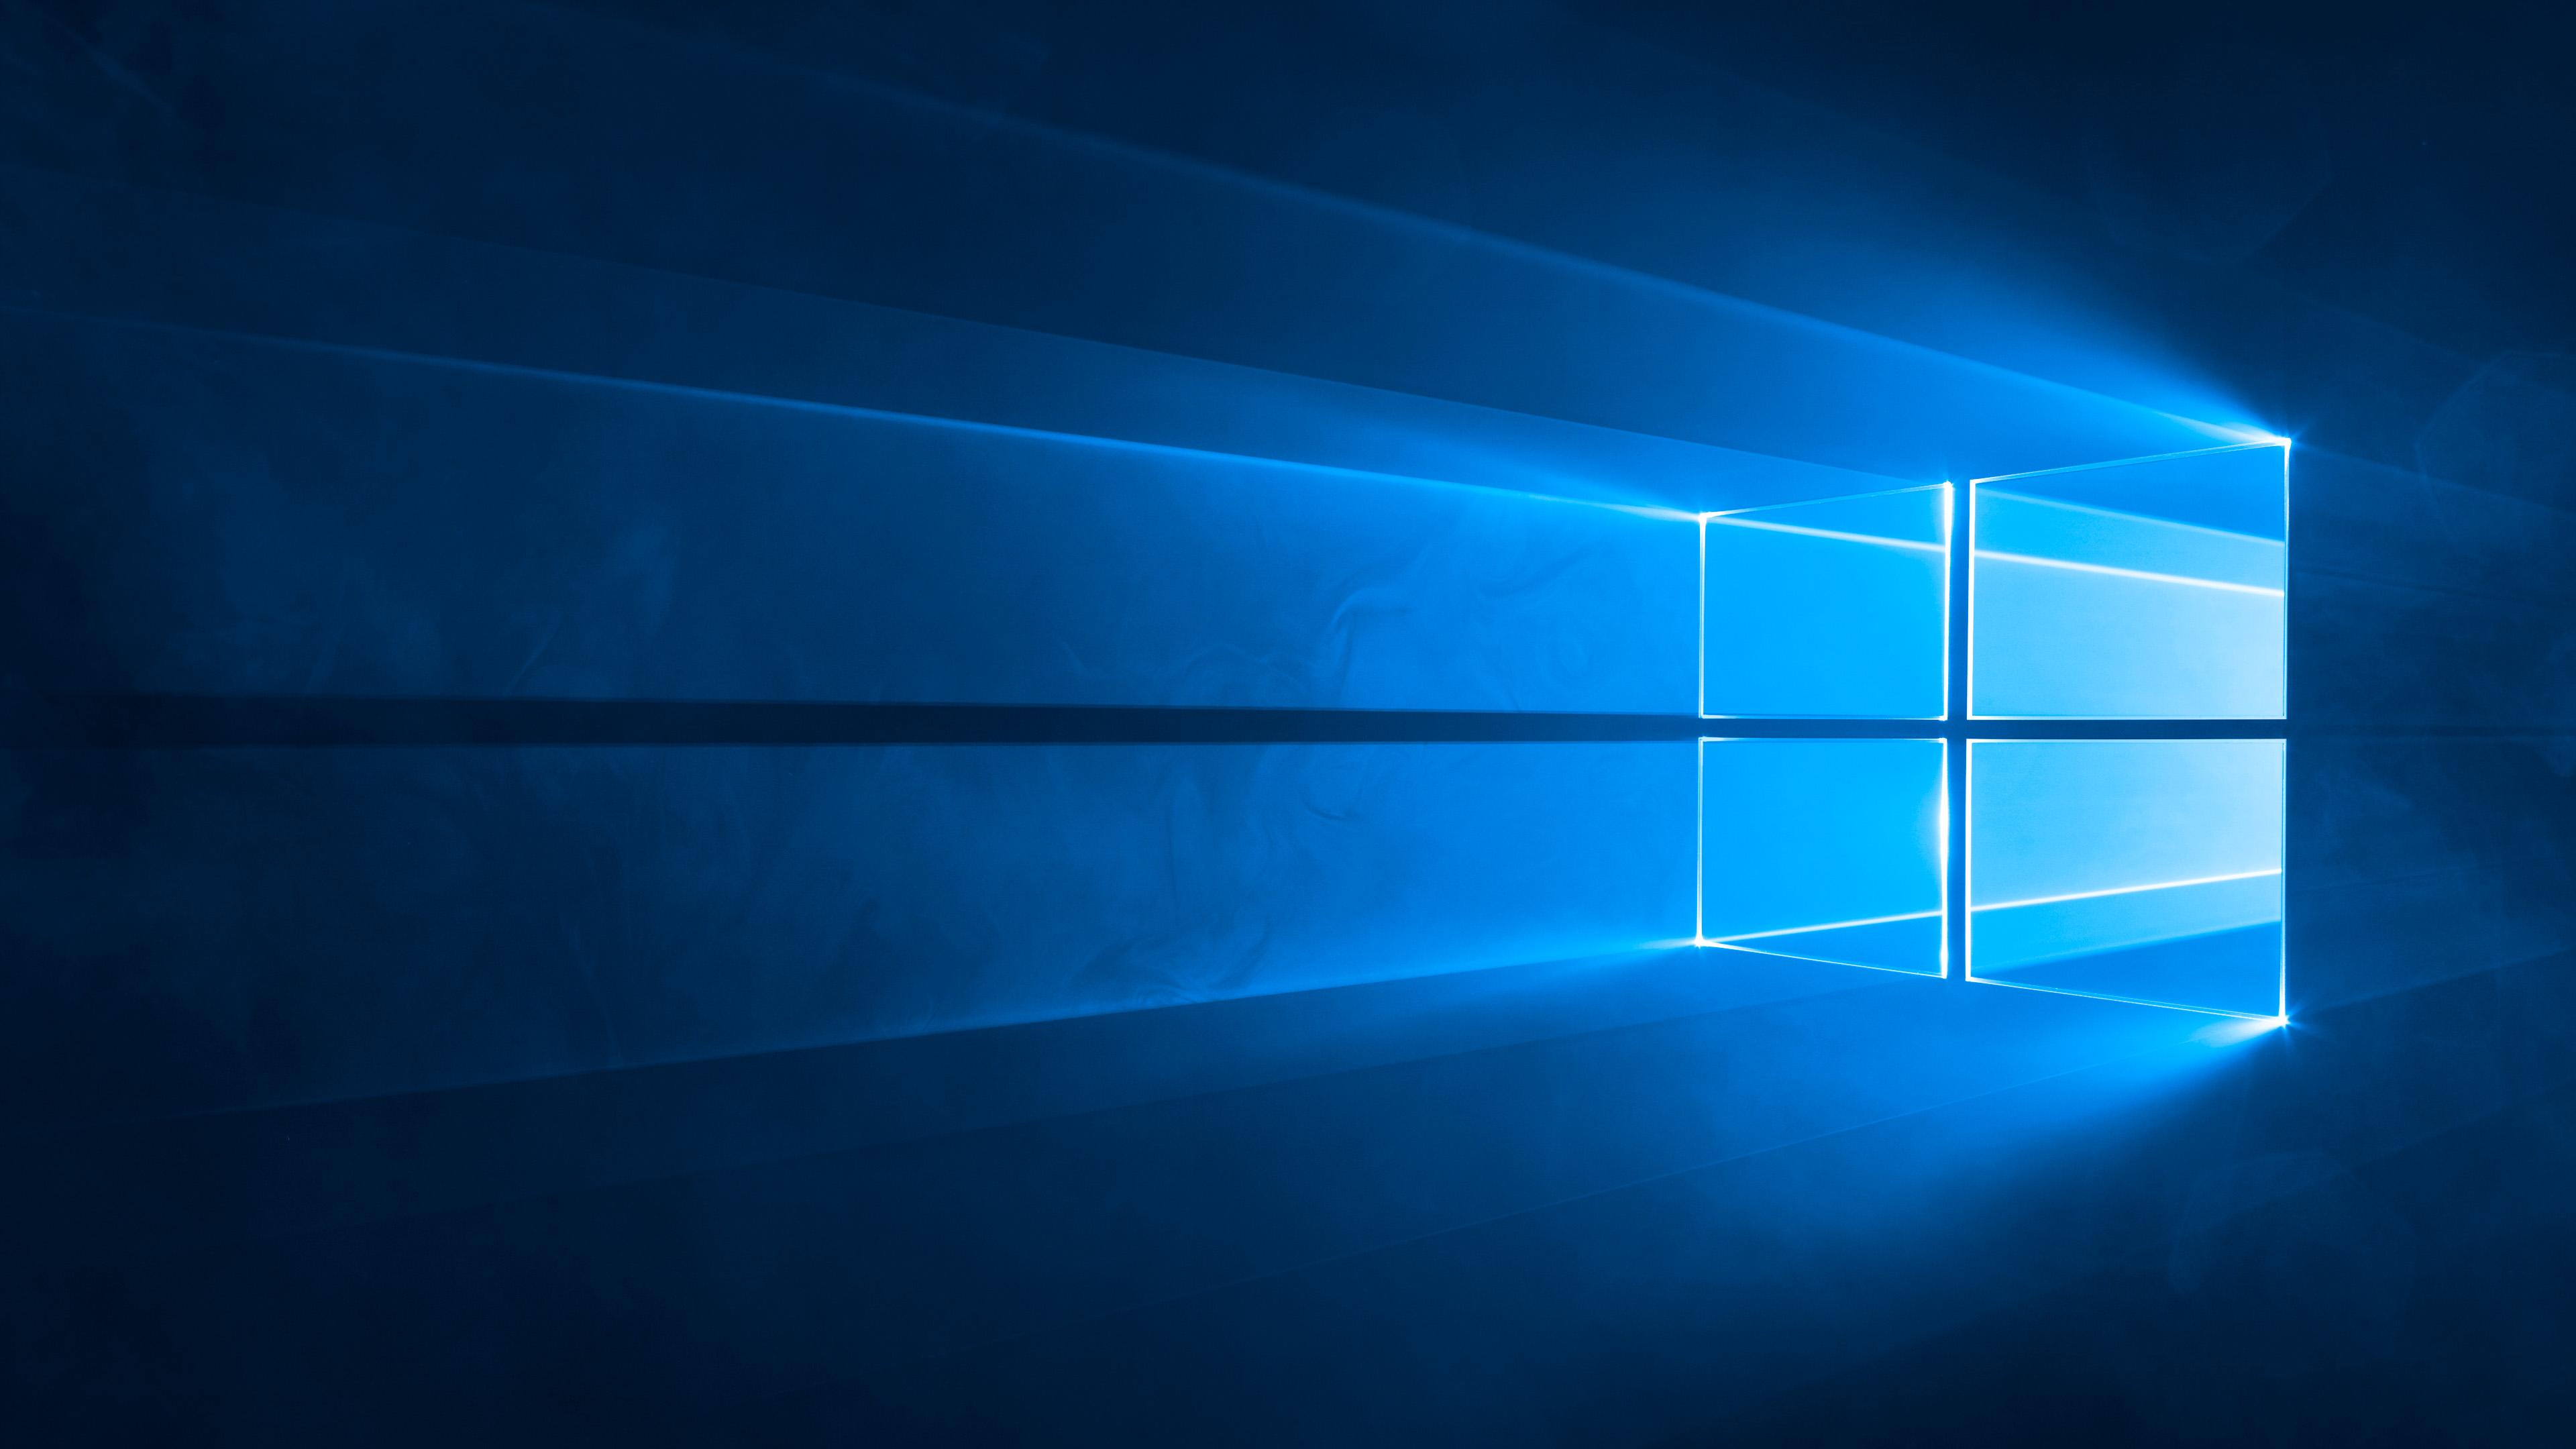 Windows10 wallpaper img0 3840x2160 3840x2160